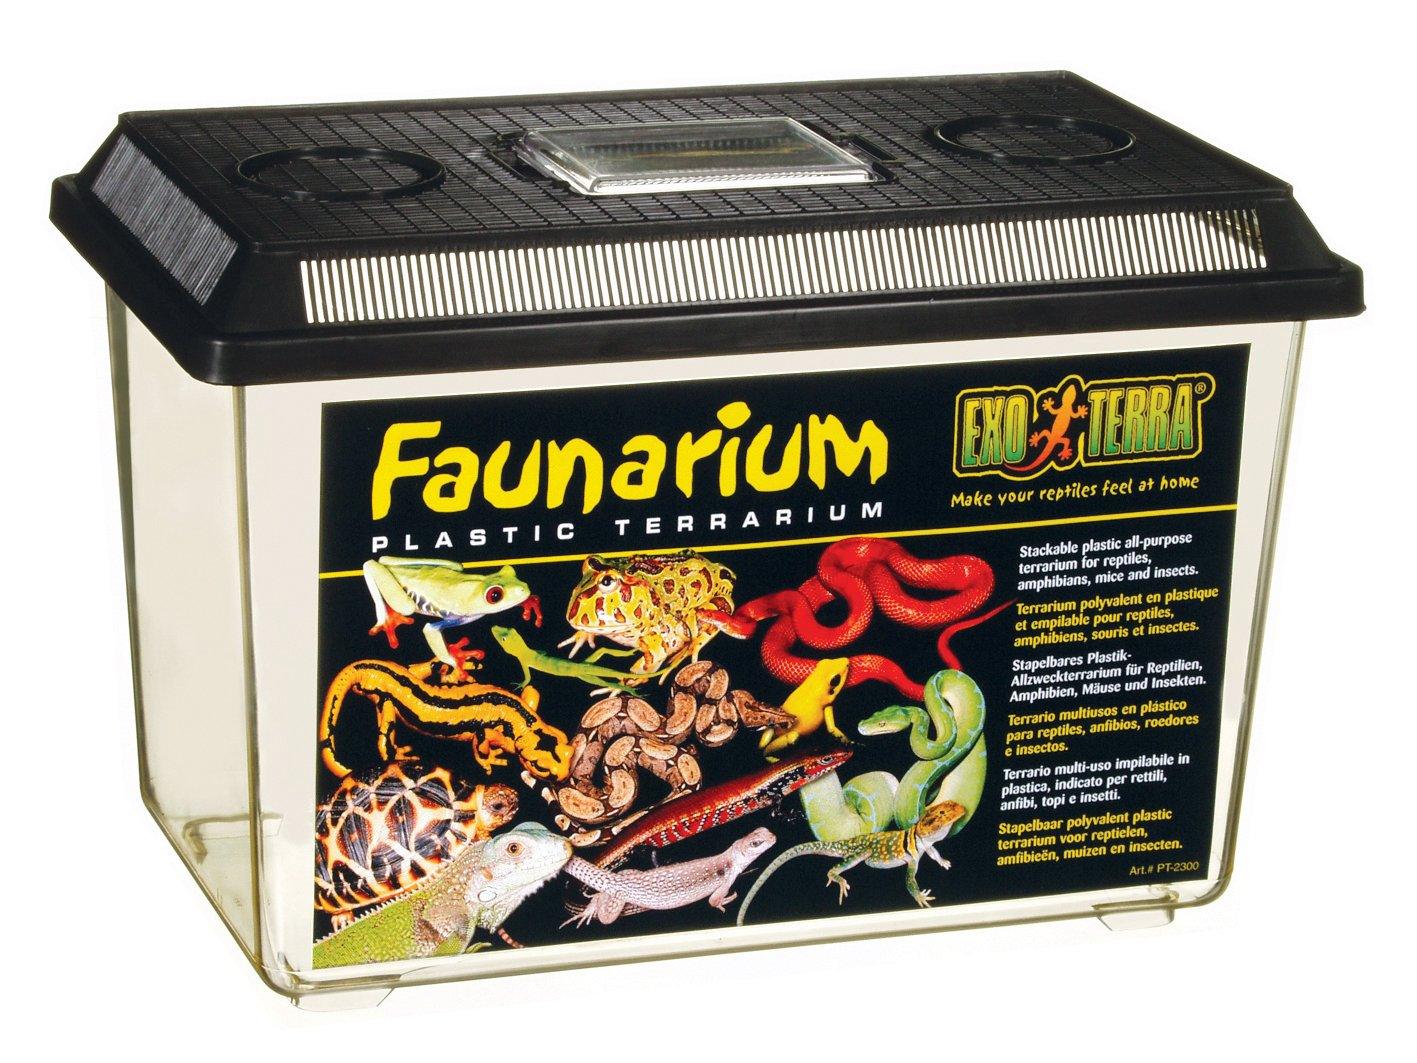 EXO Terra Faunarium Amphibien Mäuse und Insekten PT2260A1